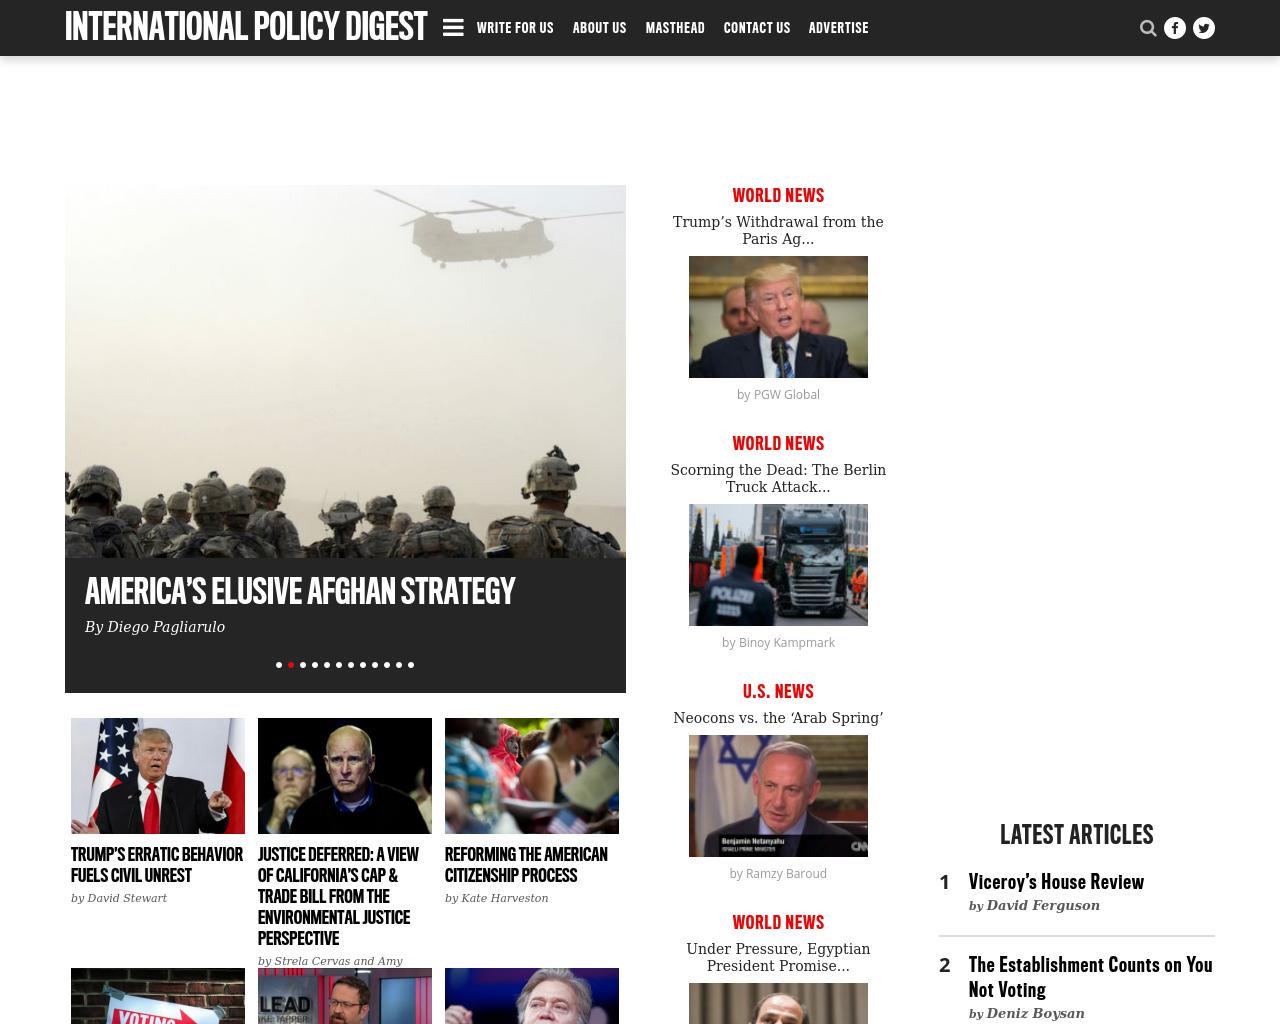 Internationalpolicydigest-Advertising-Reviews-Pricing